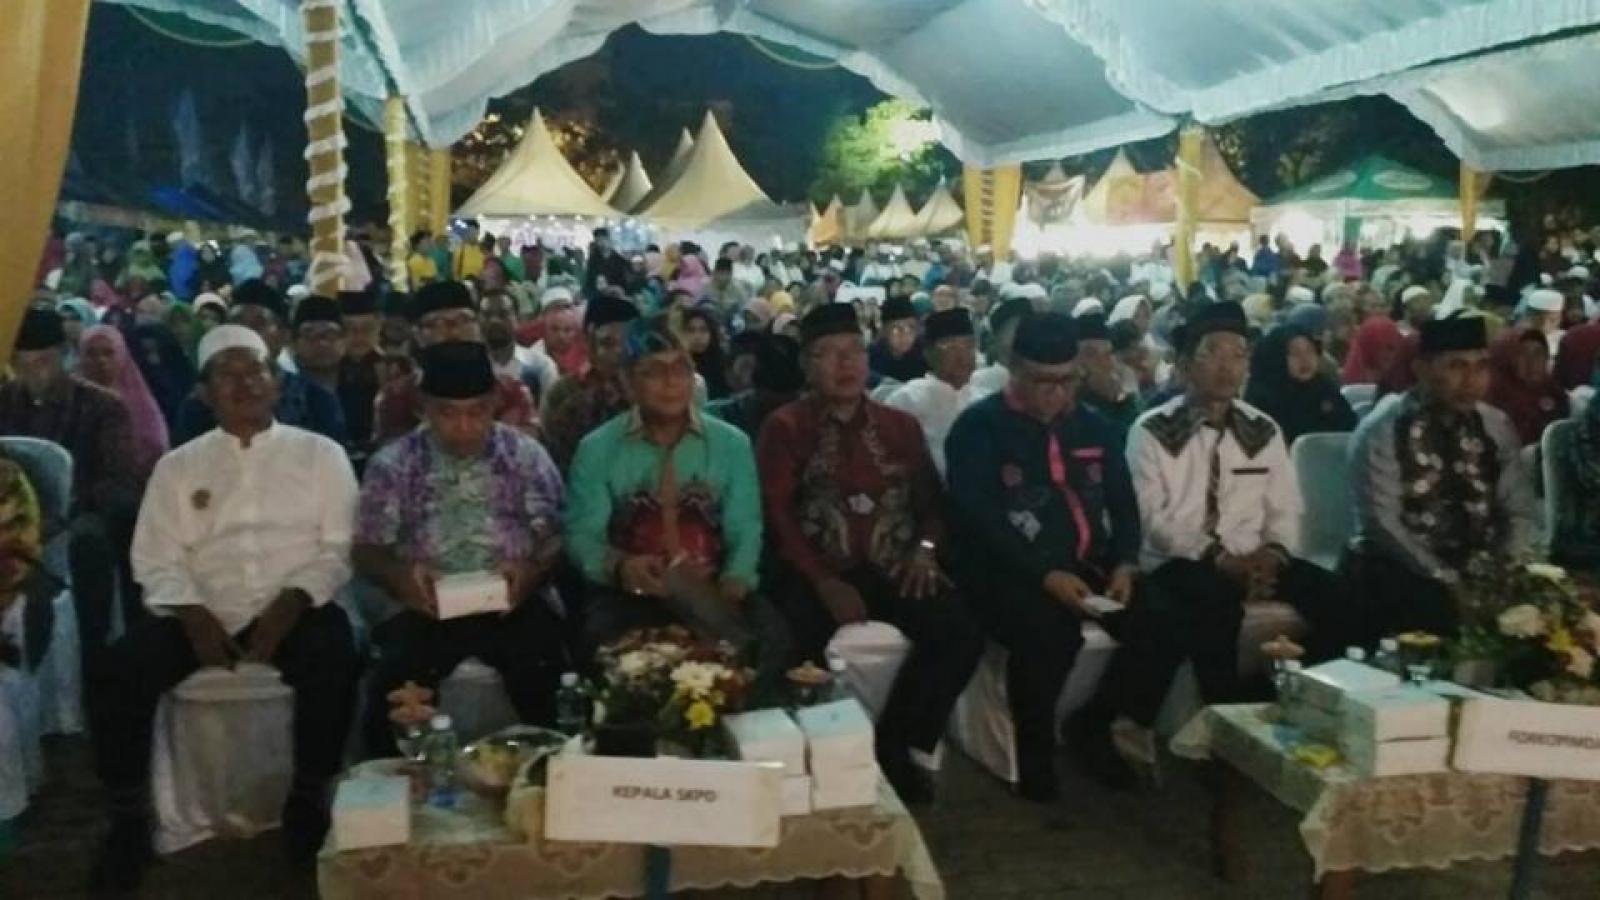 Kecamatan Banjarmasin Utara Tuan Rumah Mtq 2019 Taman Kamboja Kab